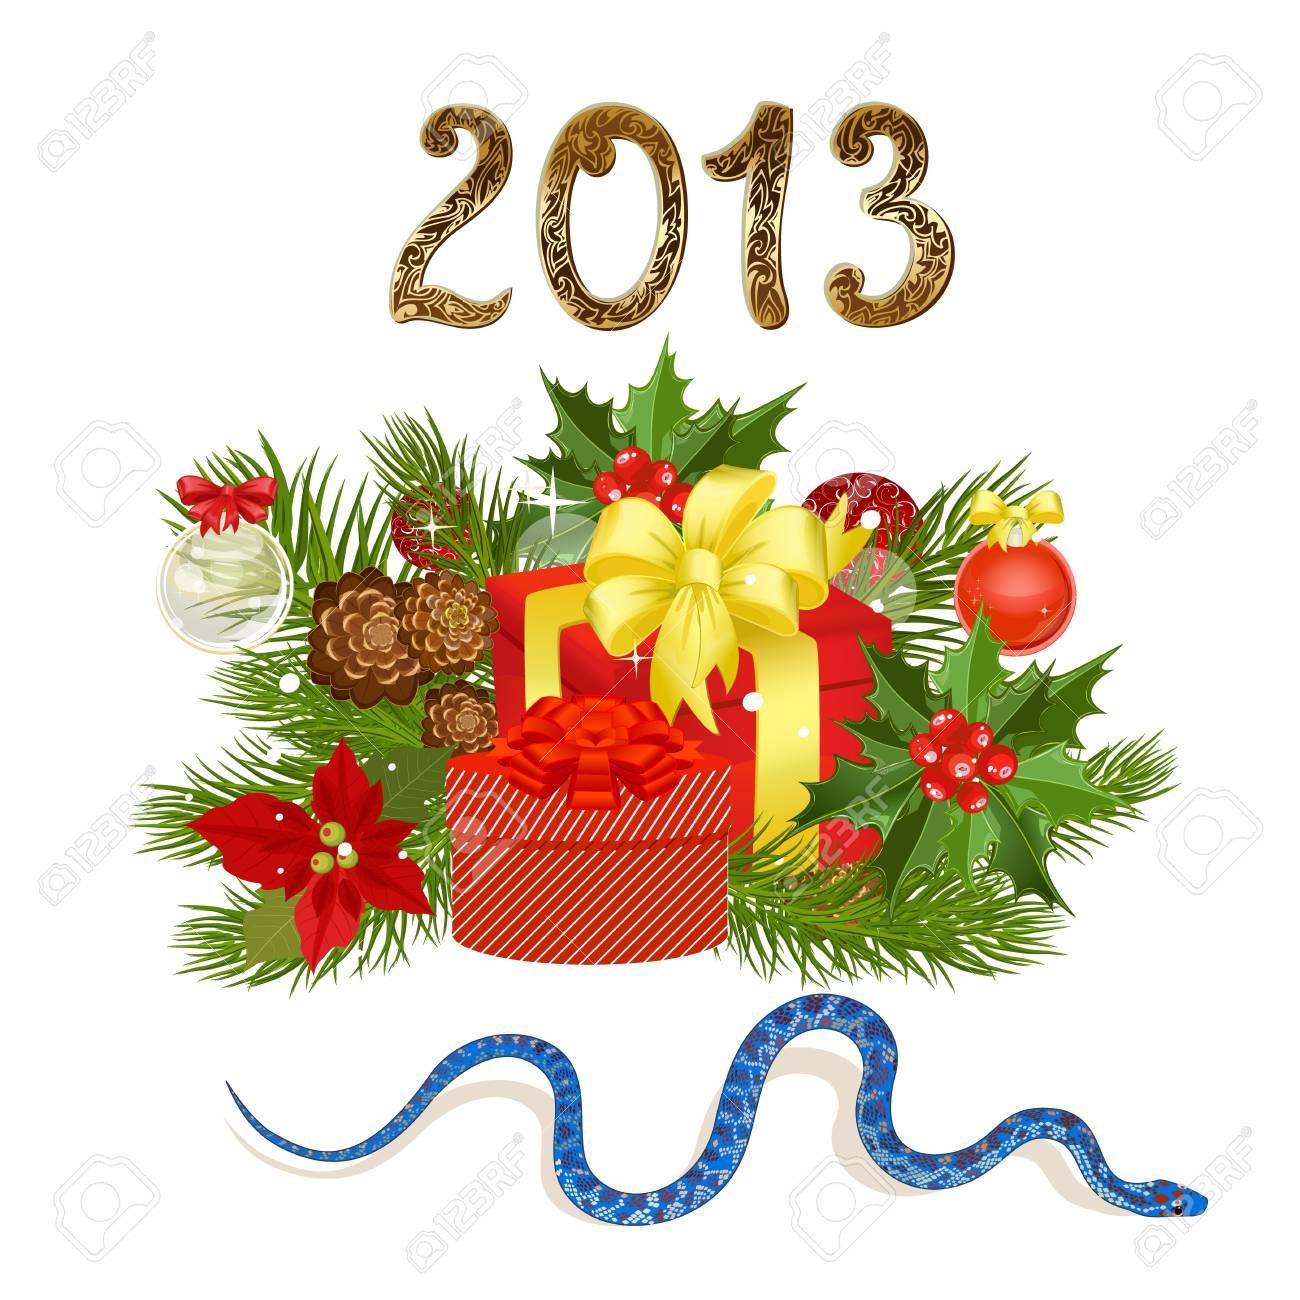 Holiday symbols 2013 Stock Vector - 17009762